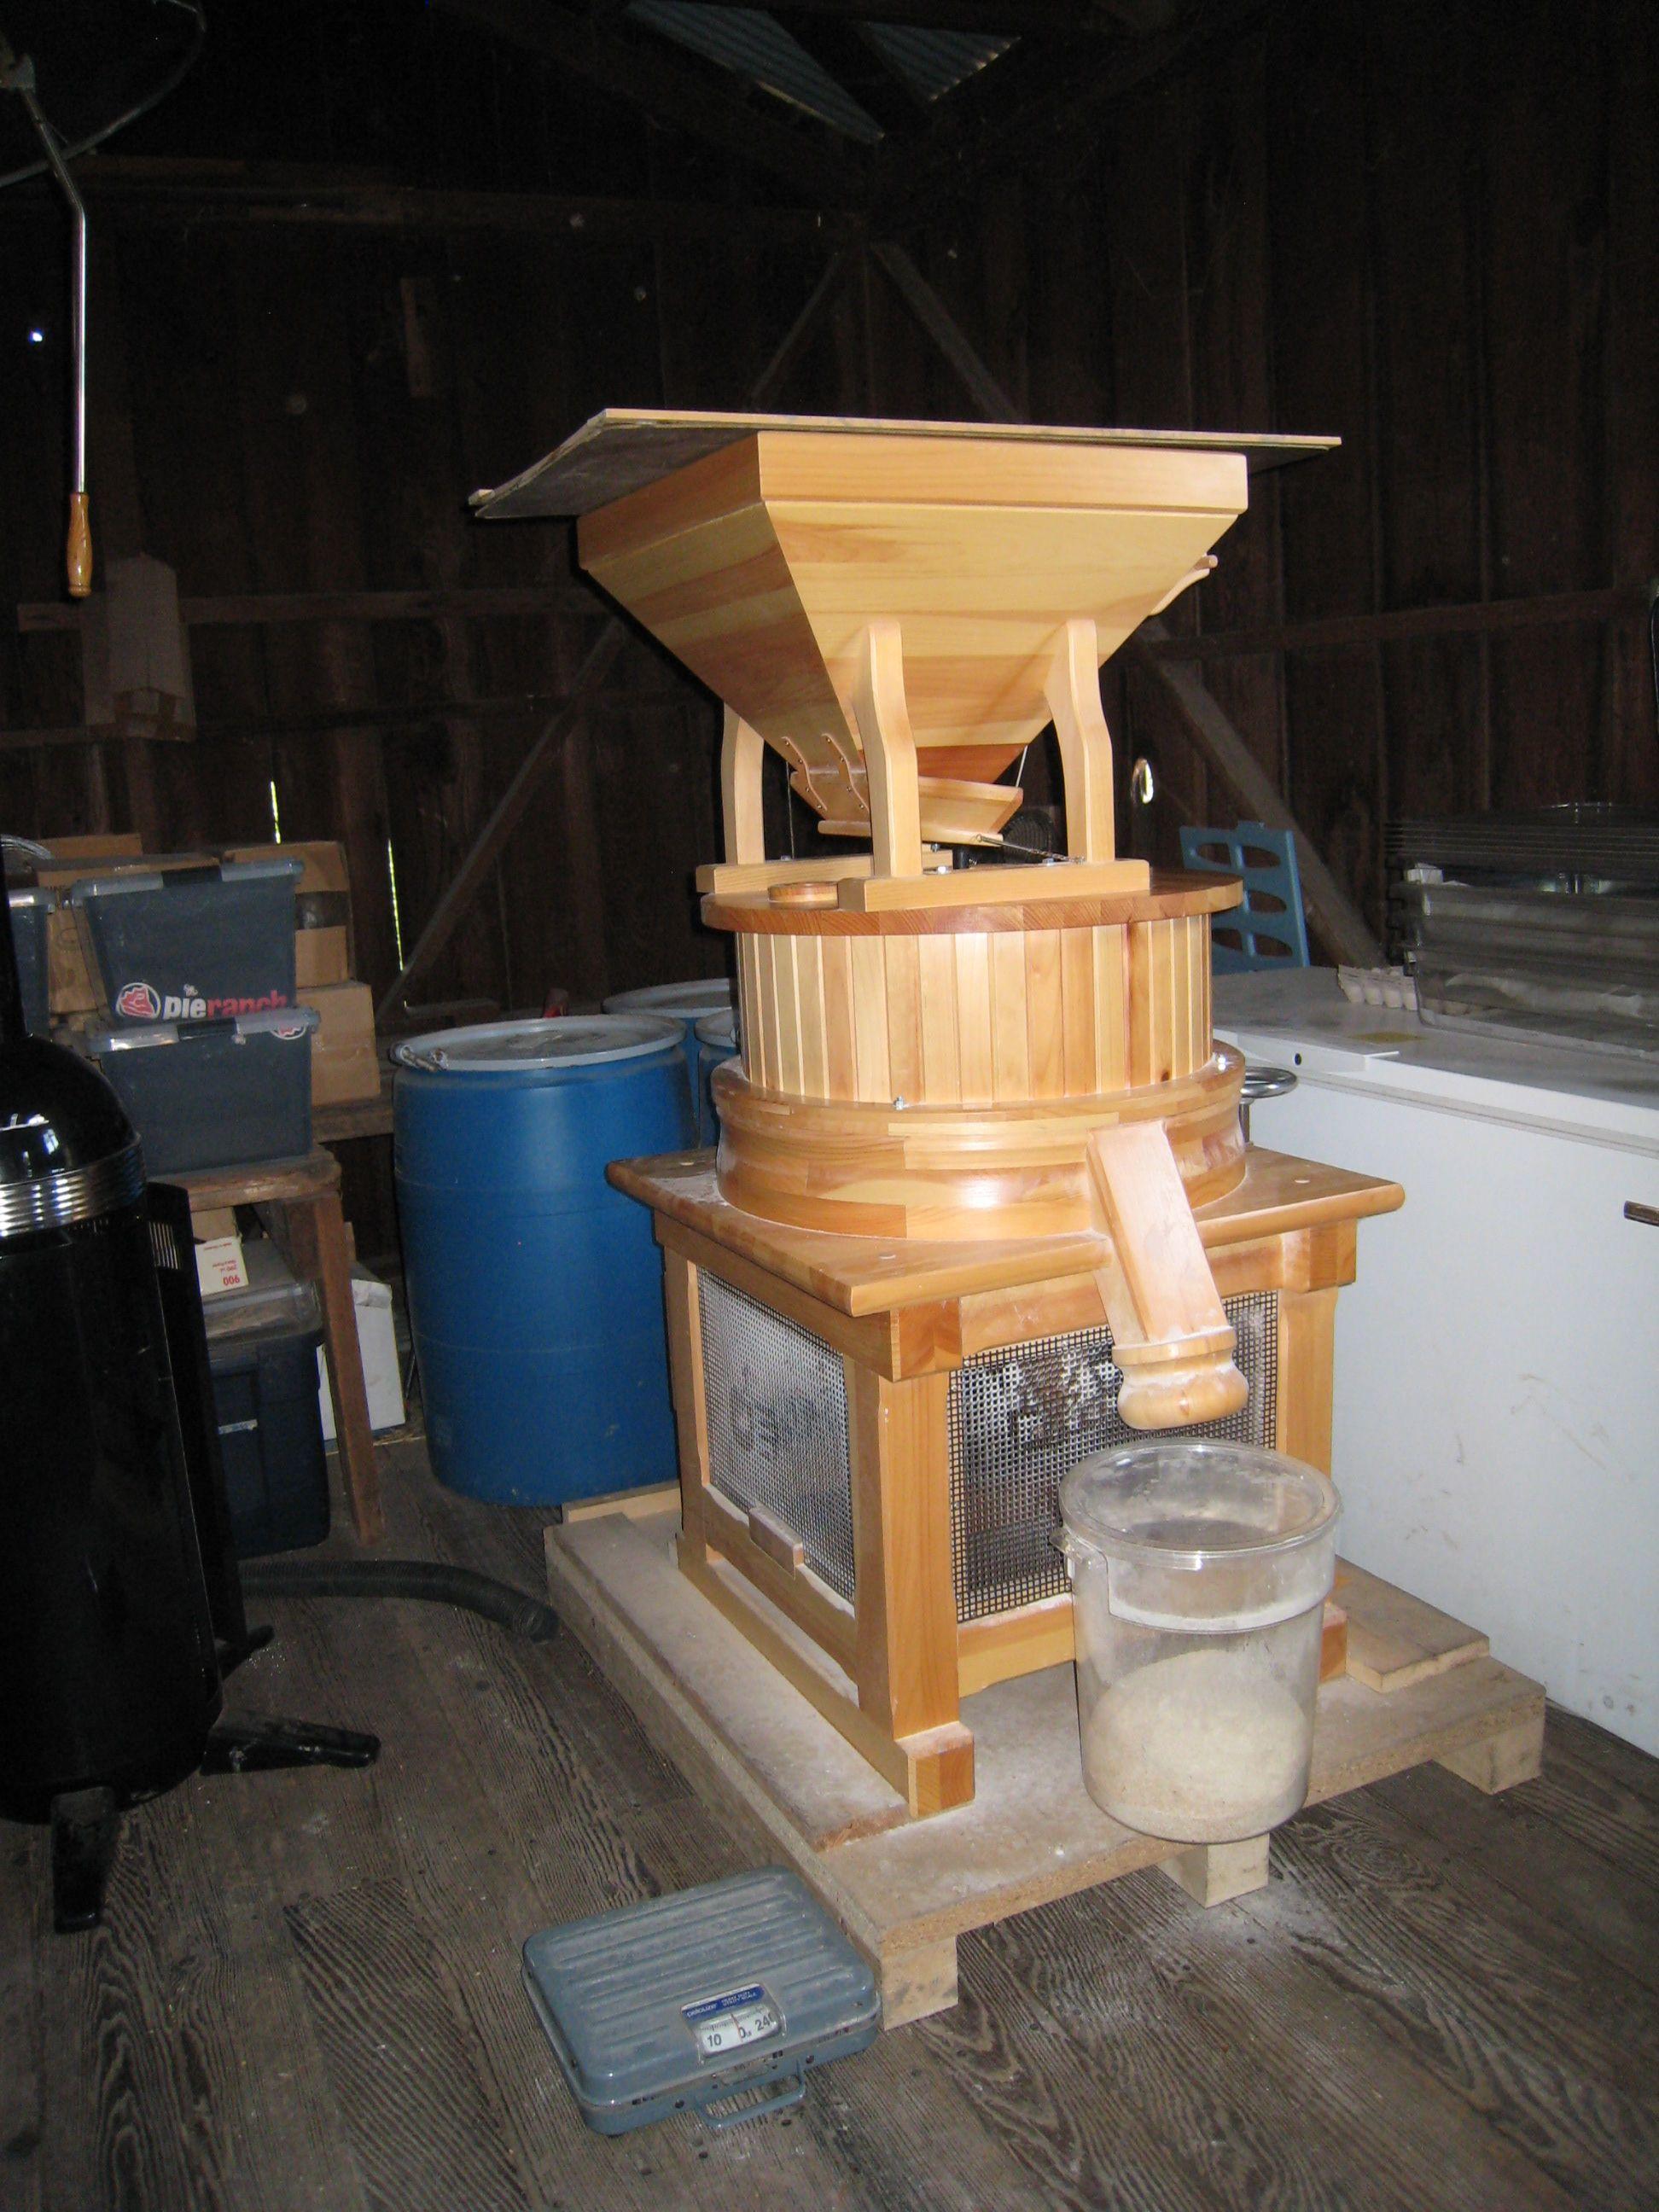 Grain grinder school garden garden design coffee maker